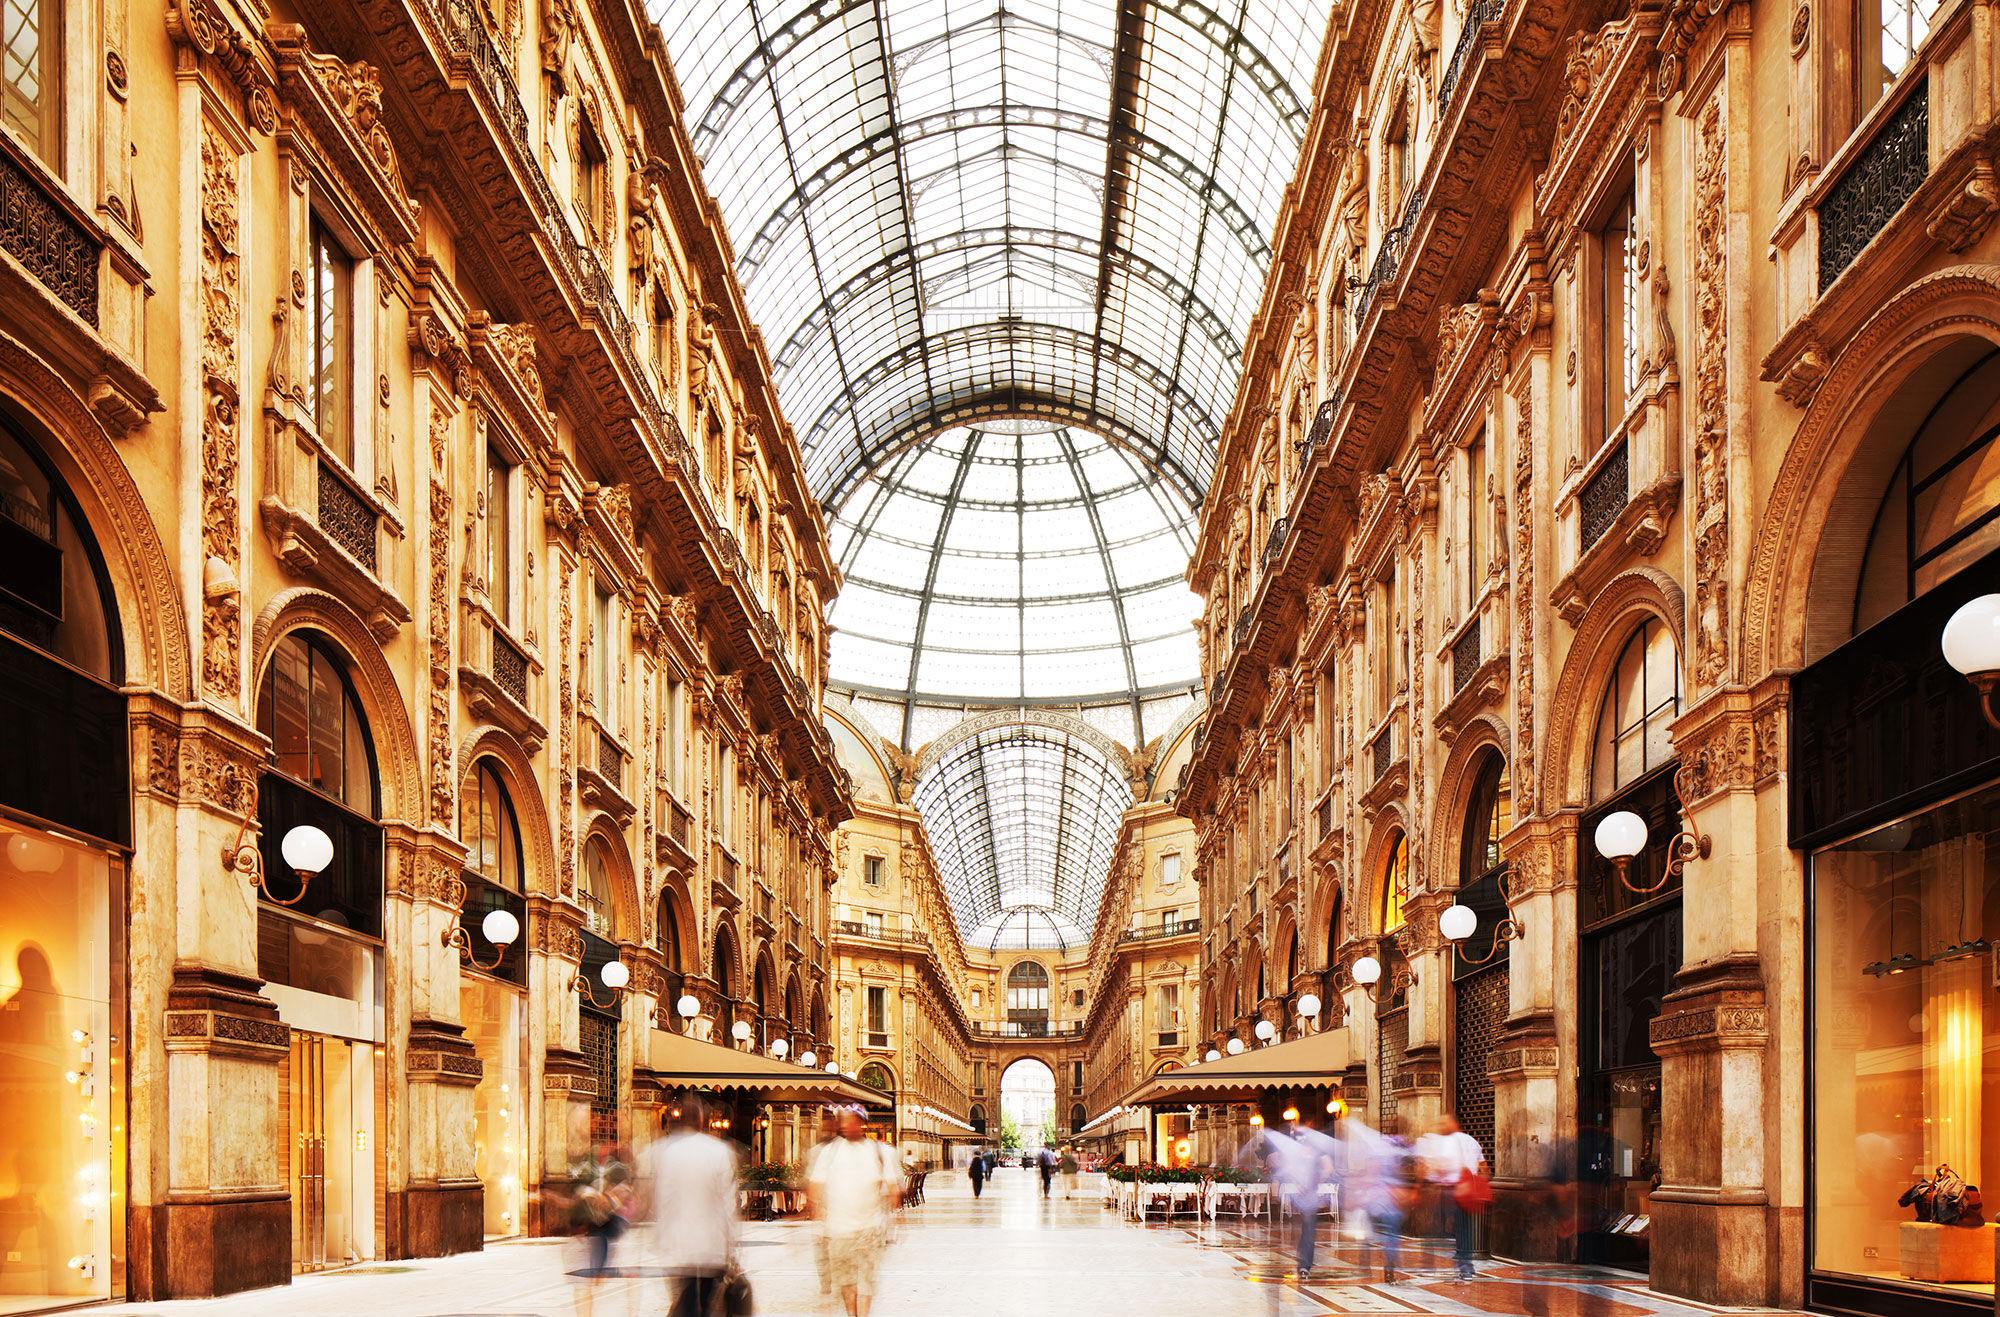 Milán. TommL | istockphoto.com/